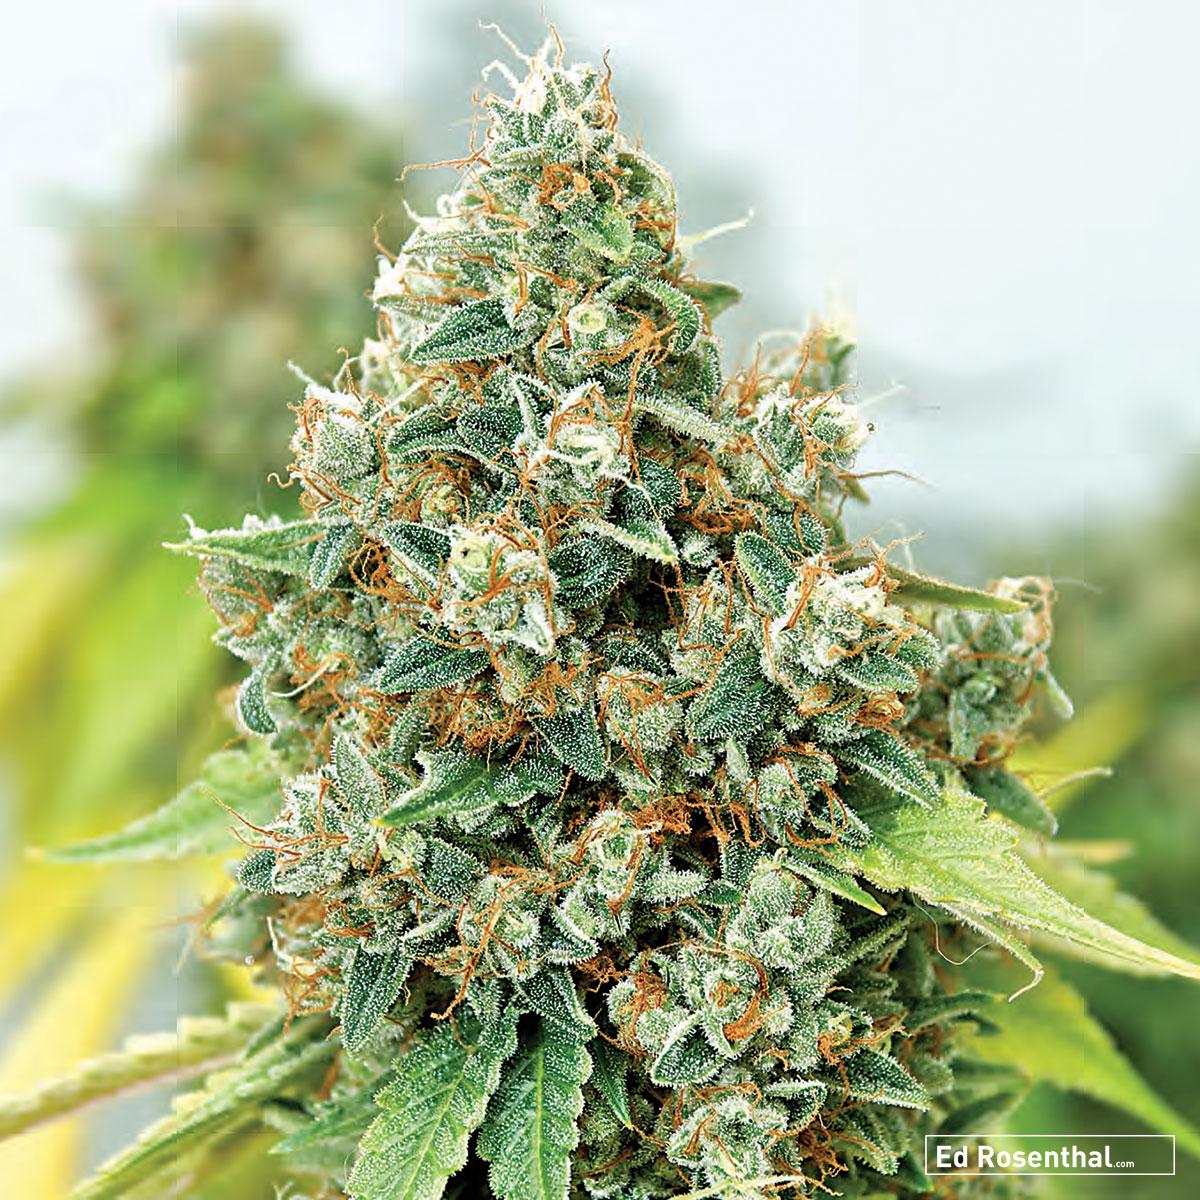 Greenthumb Seeds of Canada  - 70 S / 30 I - Uplifting, heady, happy - Hashy